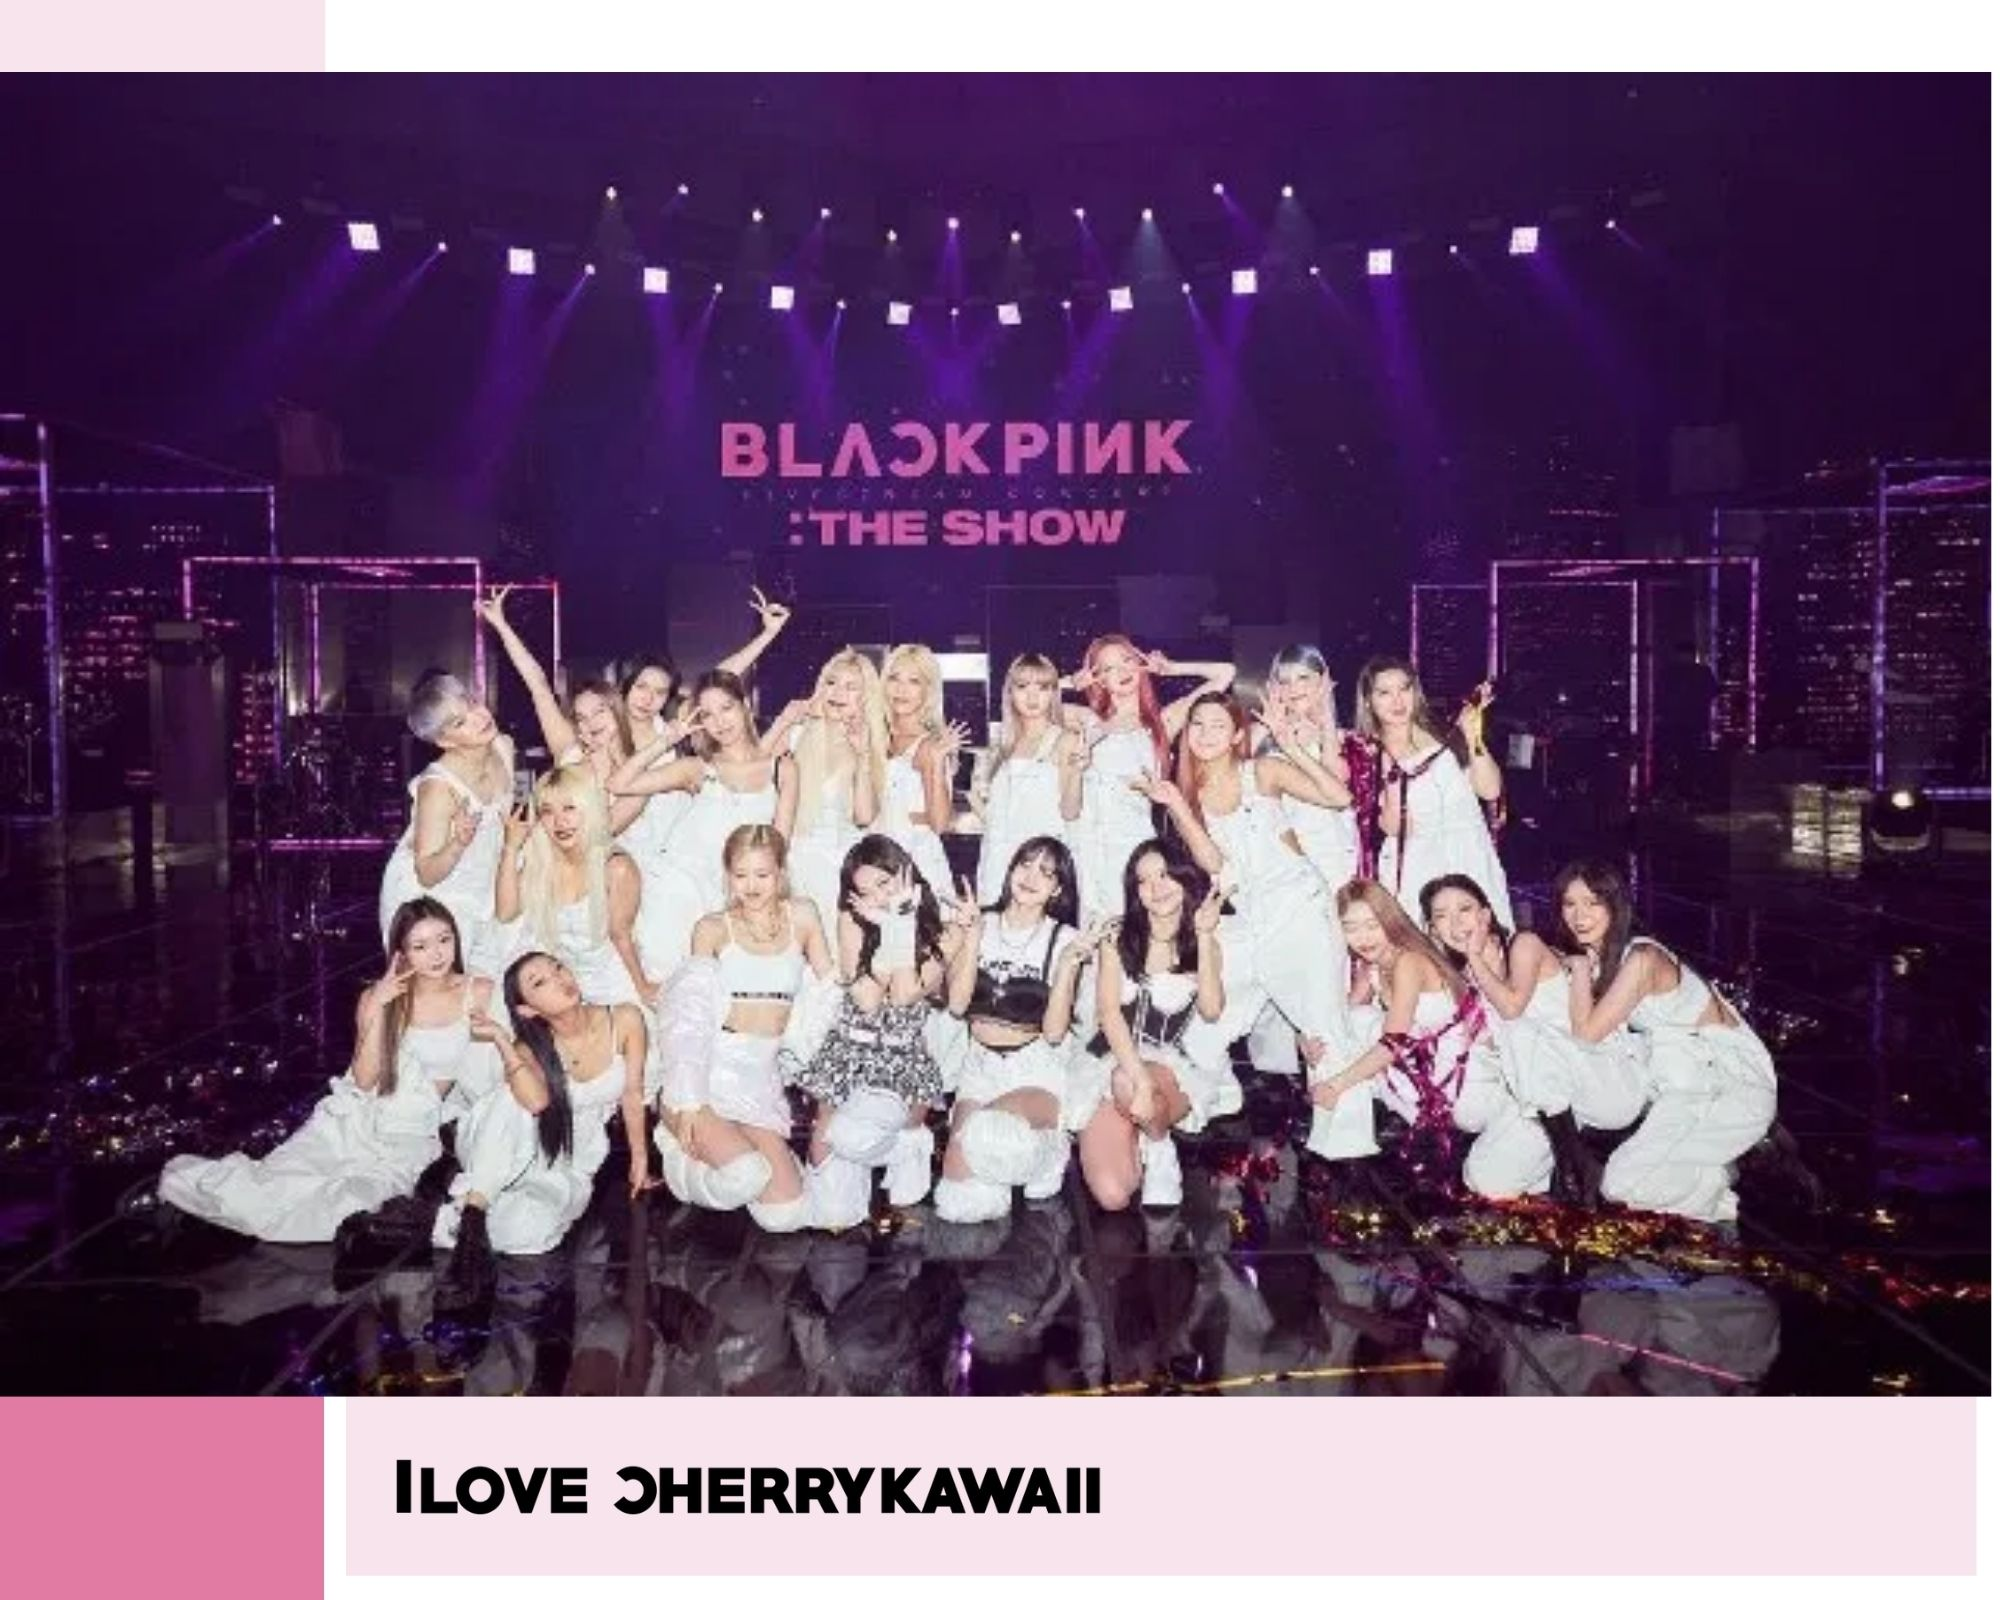 BLACKPINK Rose Jennie Lisa y Jisoo final de The show